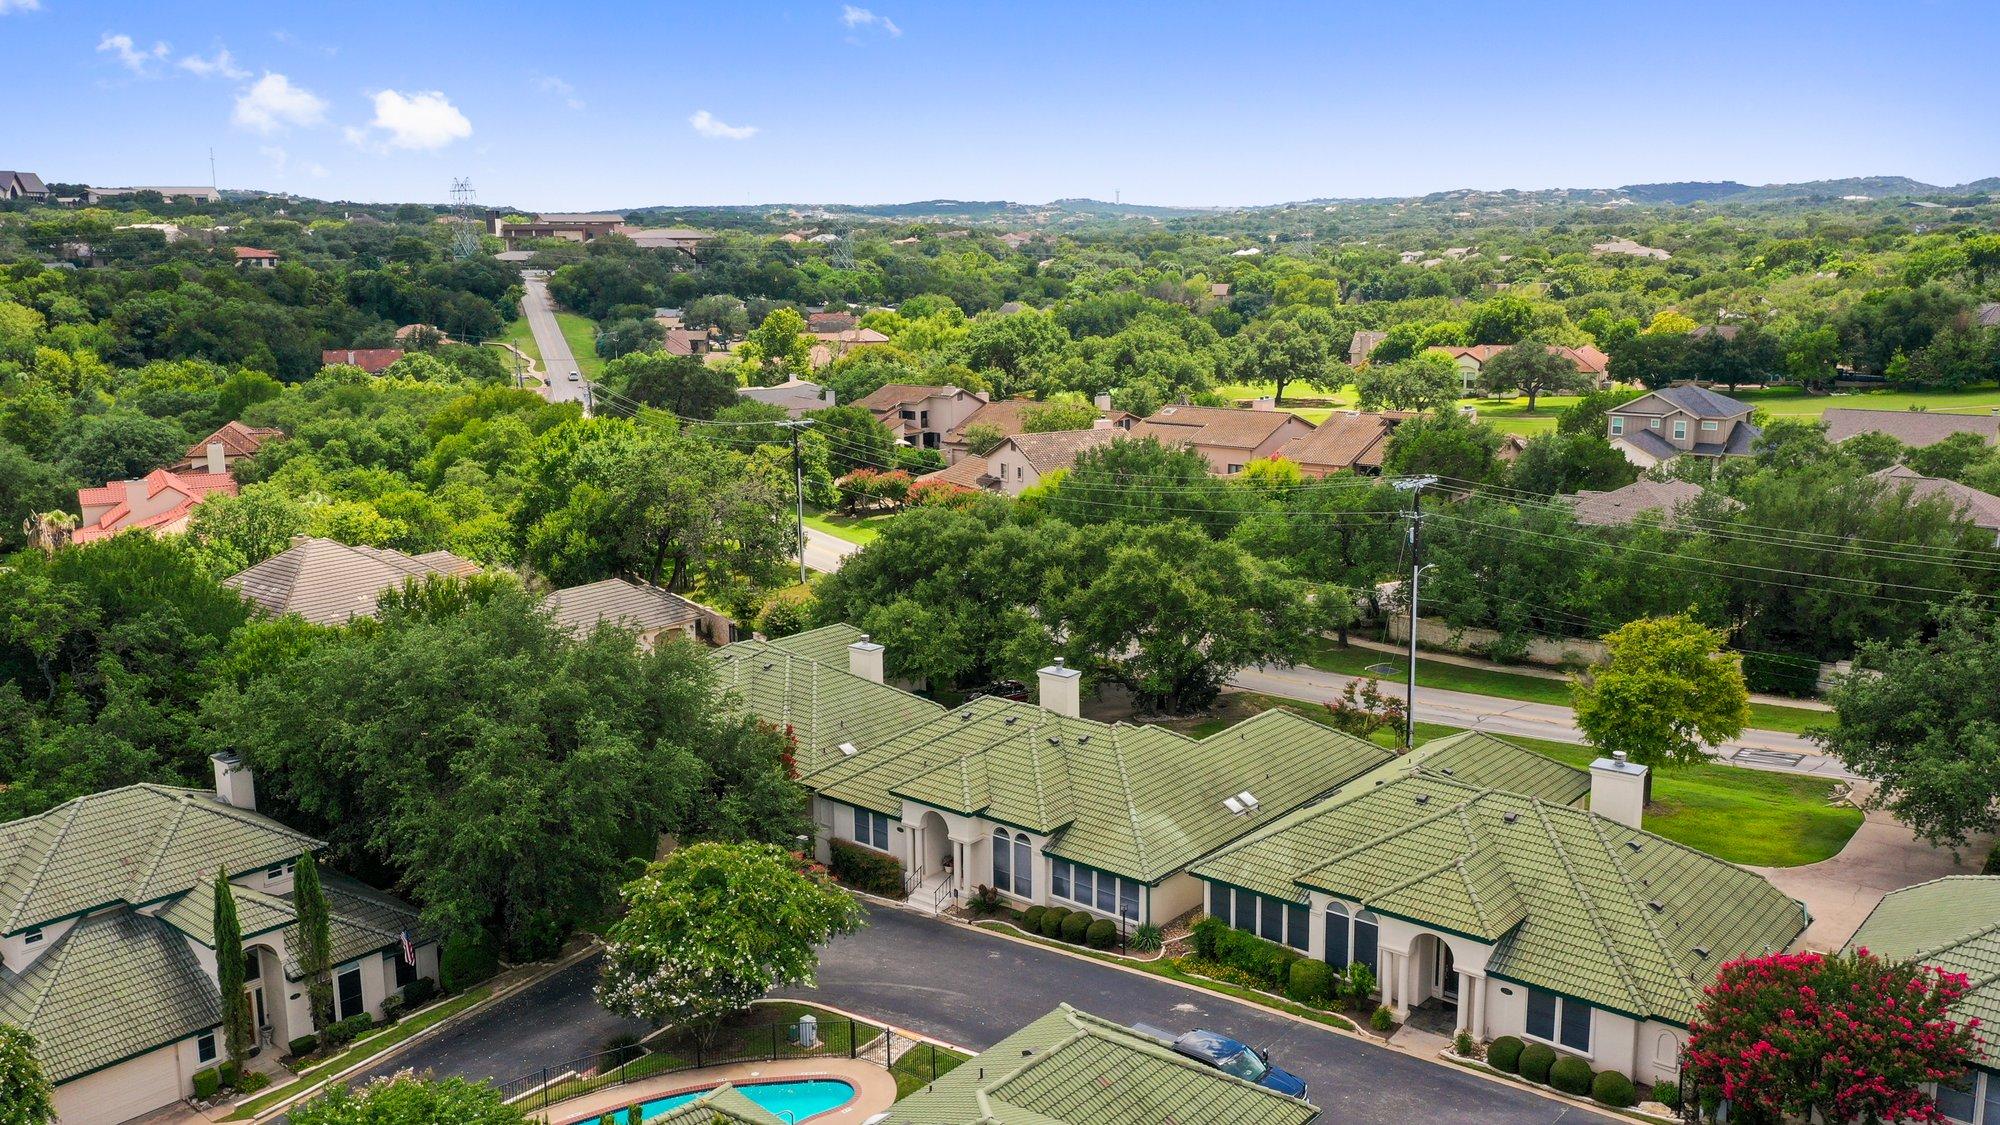 Condo in Austin, Texas, United States 1 - 11556050